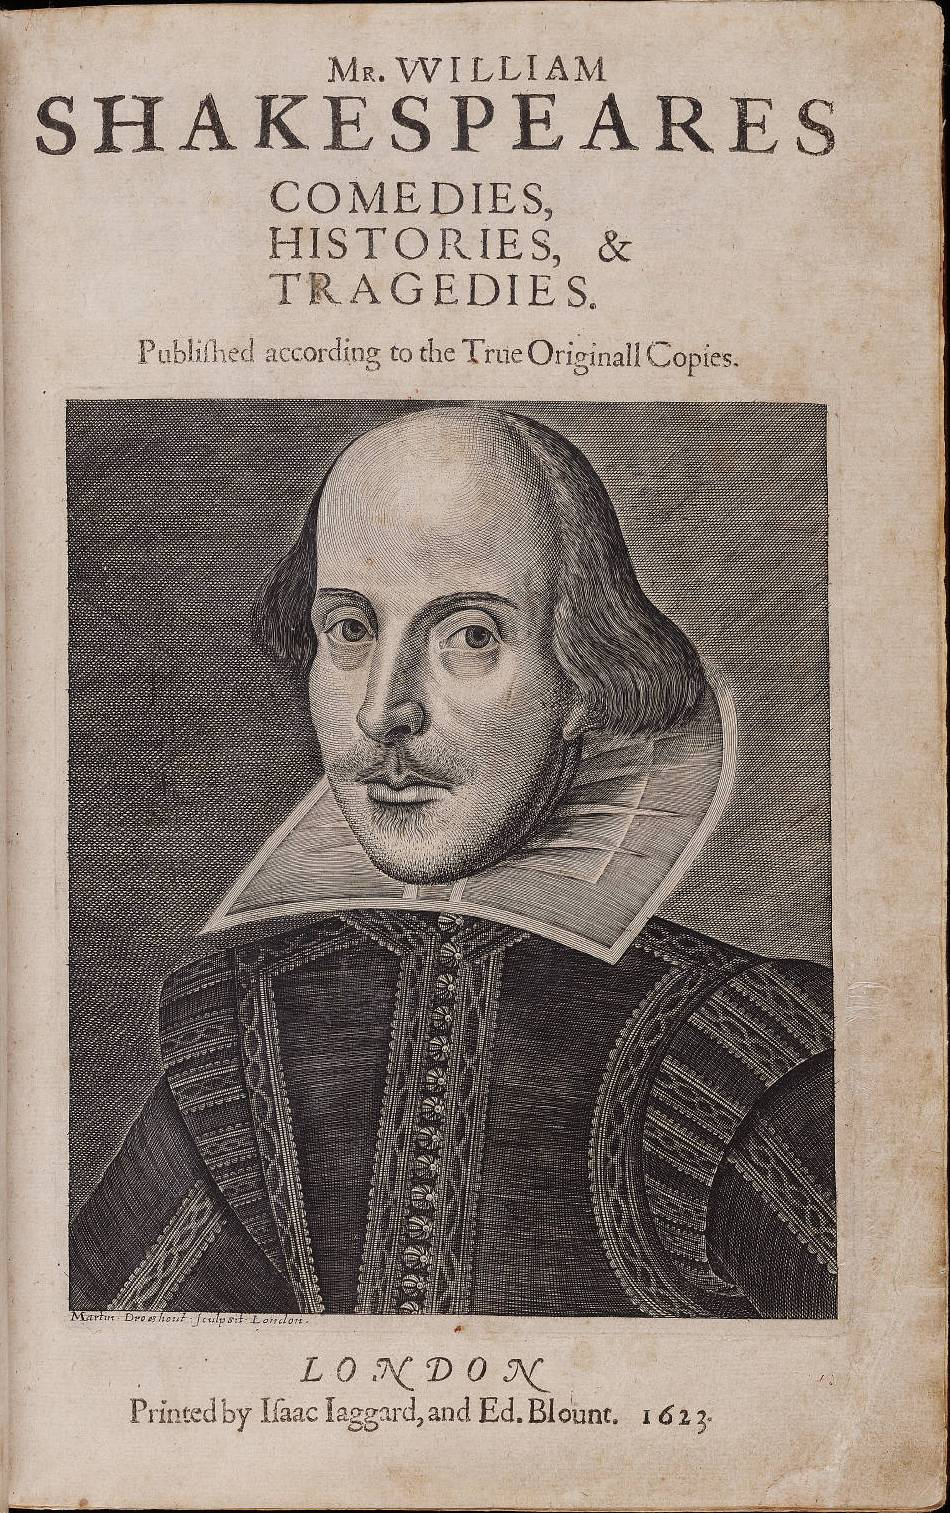 Shakespeare's myth-01